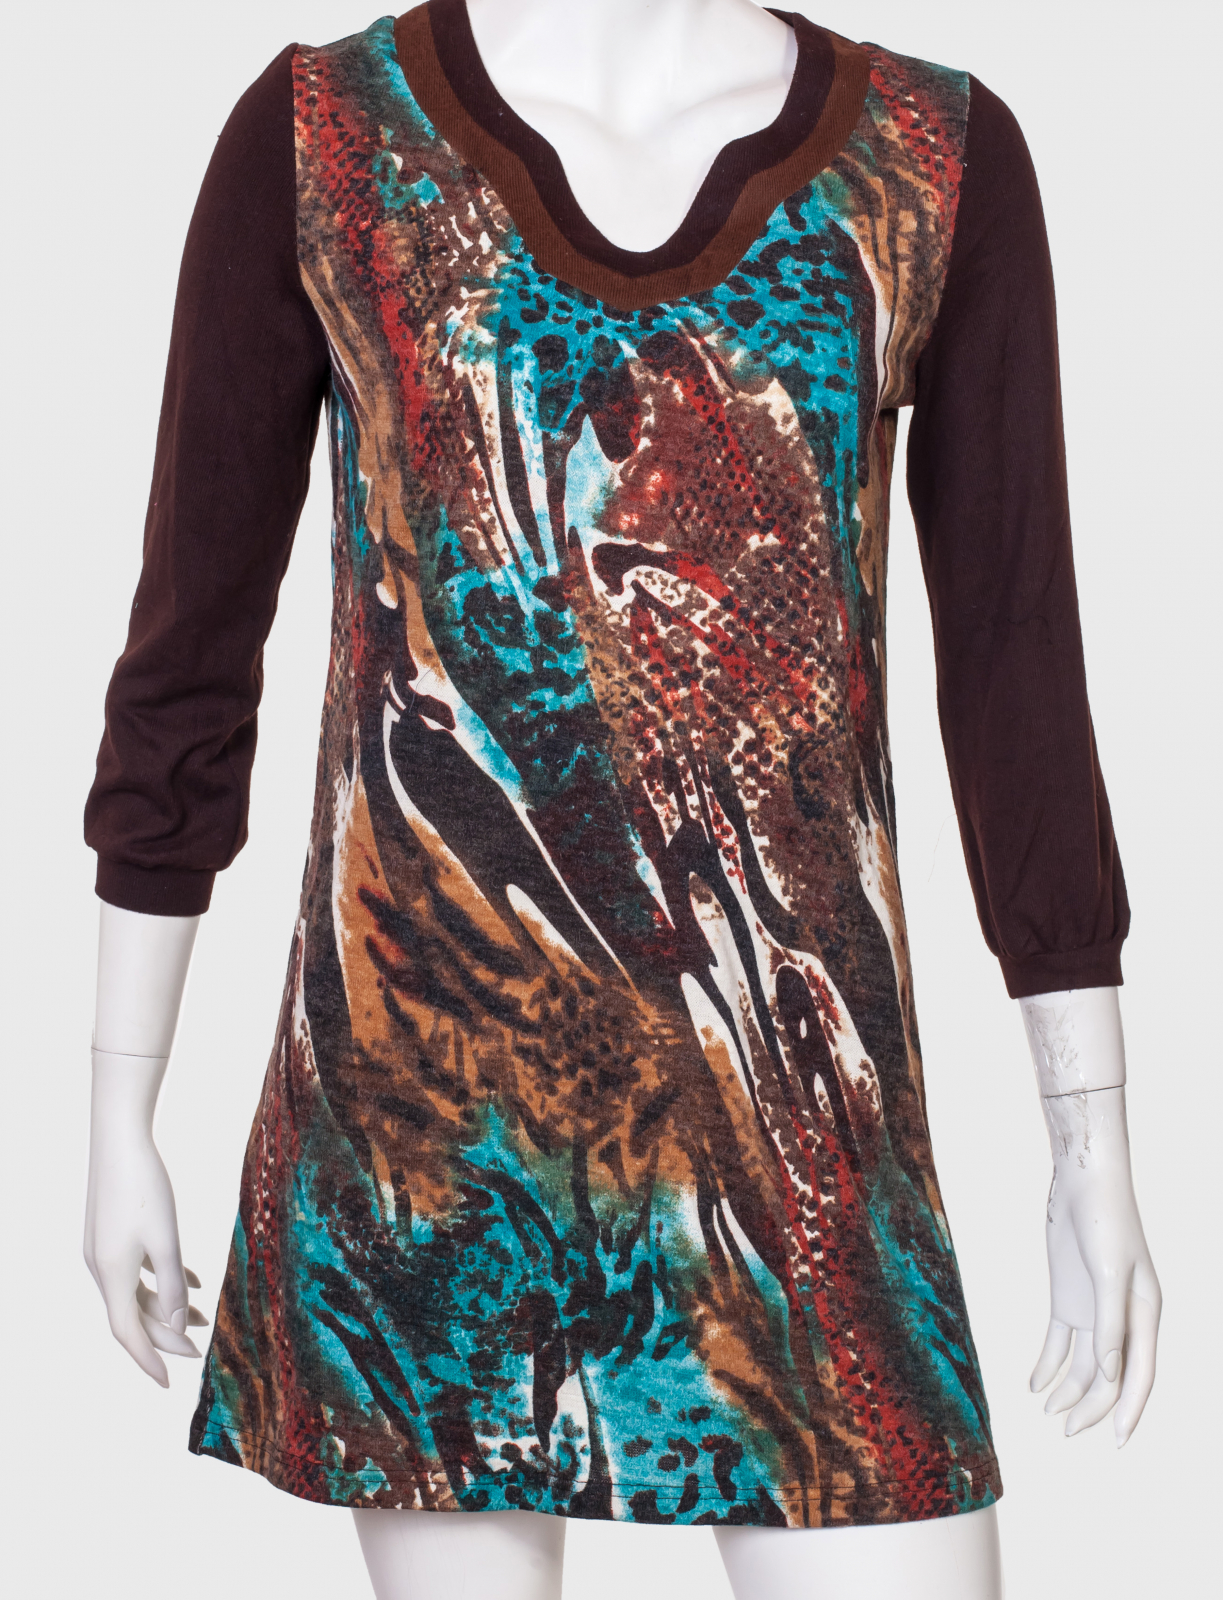 Харизматичное брендовое платье-туника от бренда Mechant